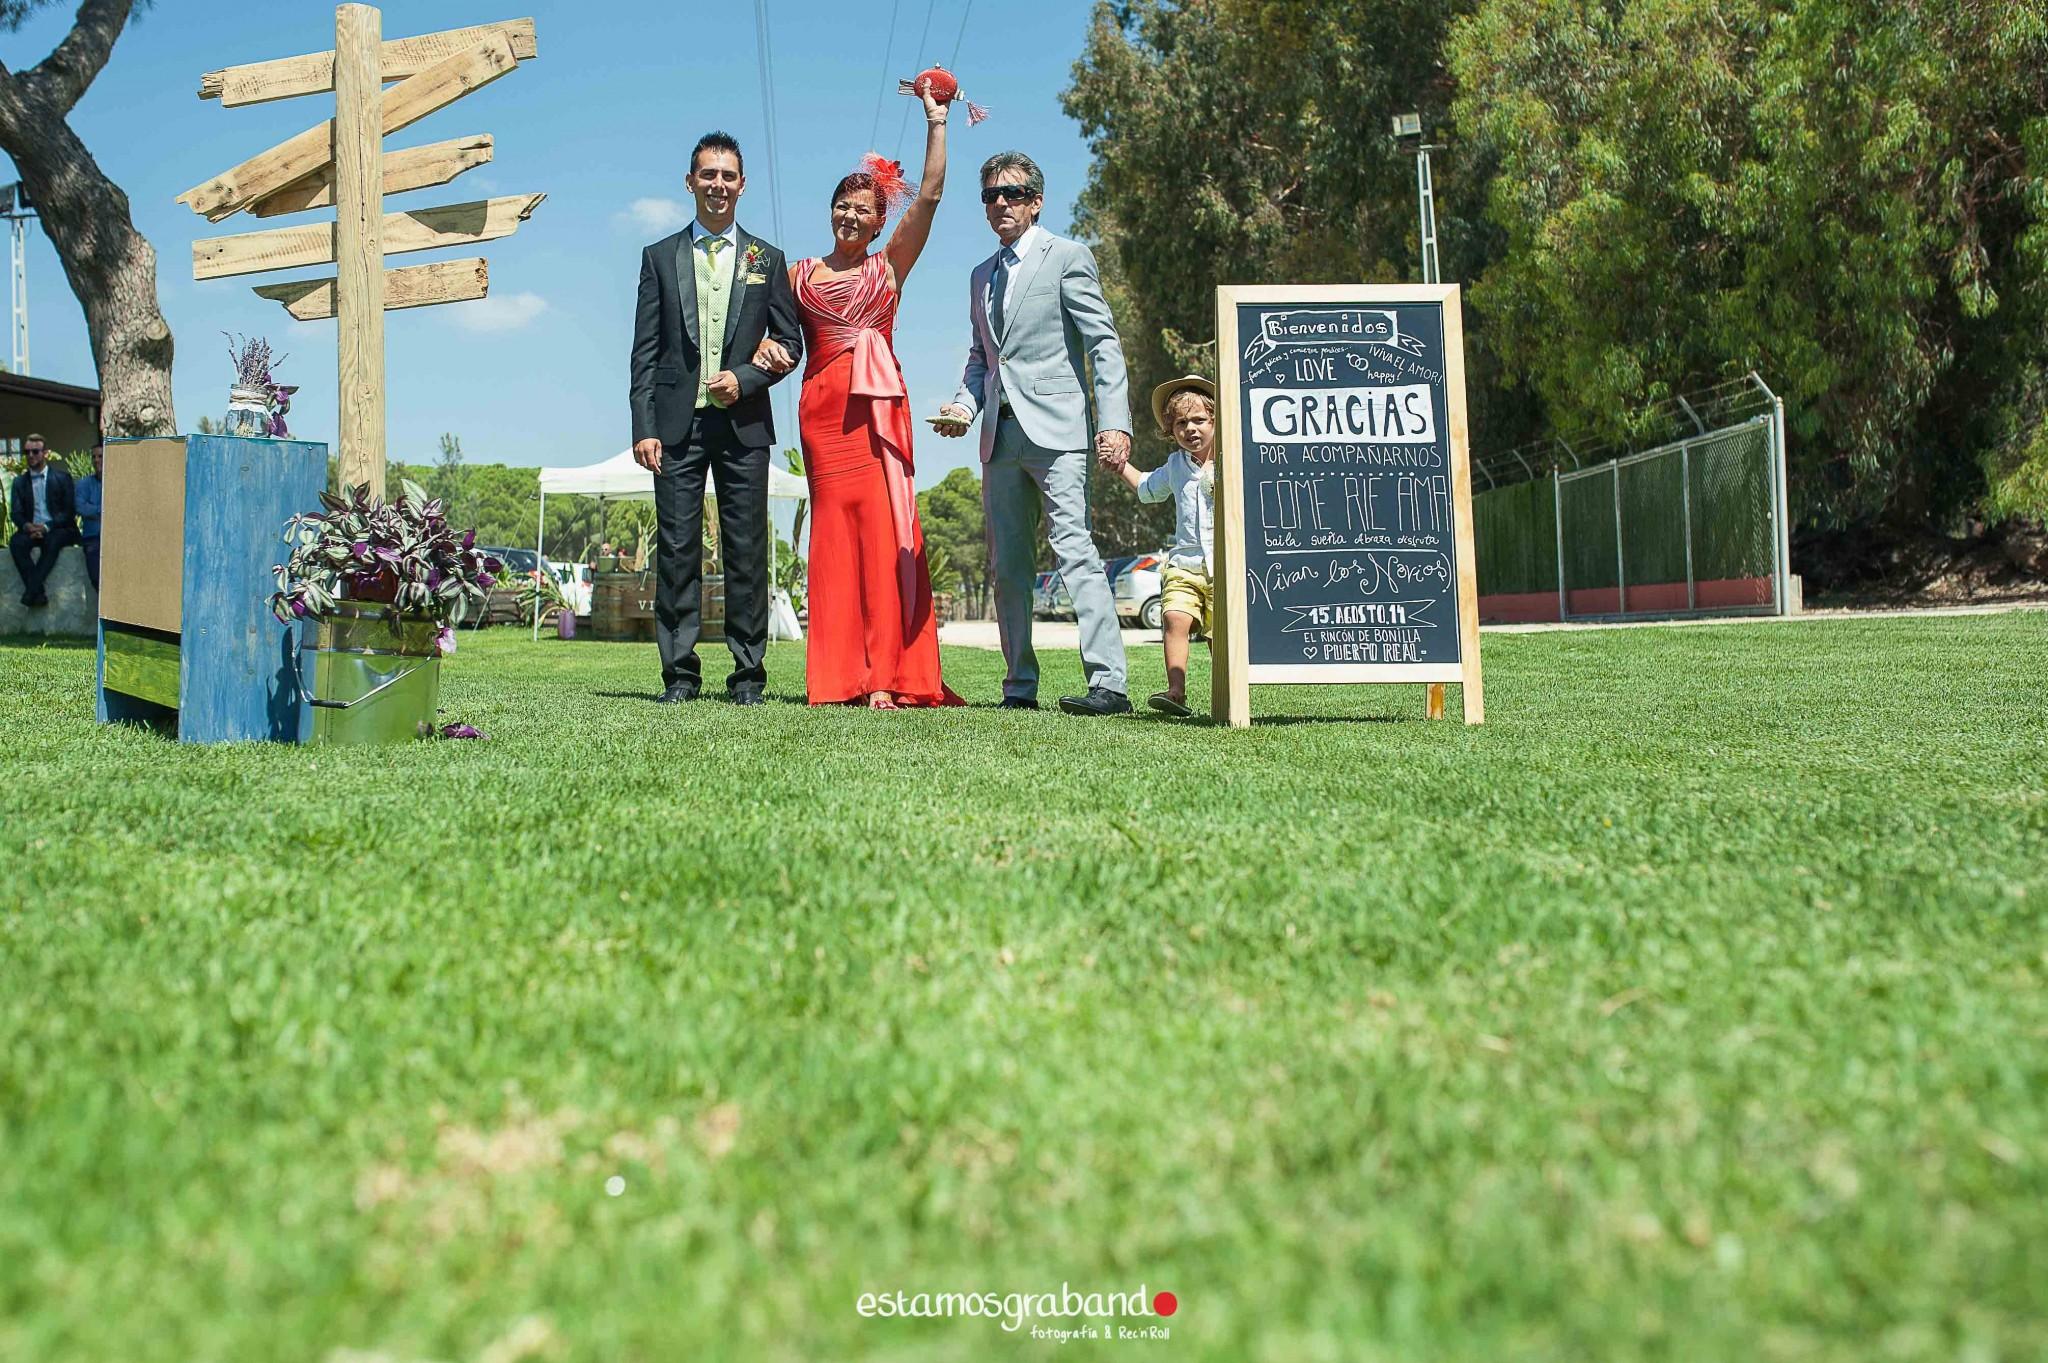 pili-y-jose_fotograficc81a-cadiz-34 Pili & Jose - video boda cadiz